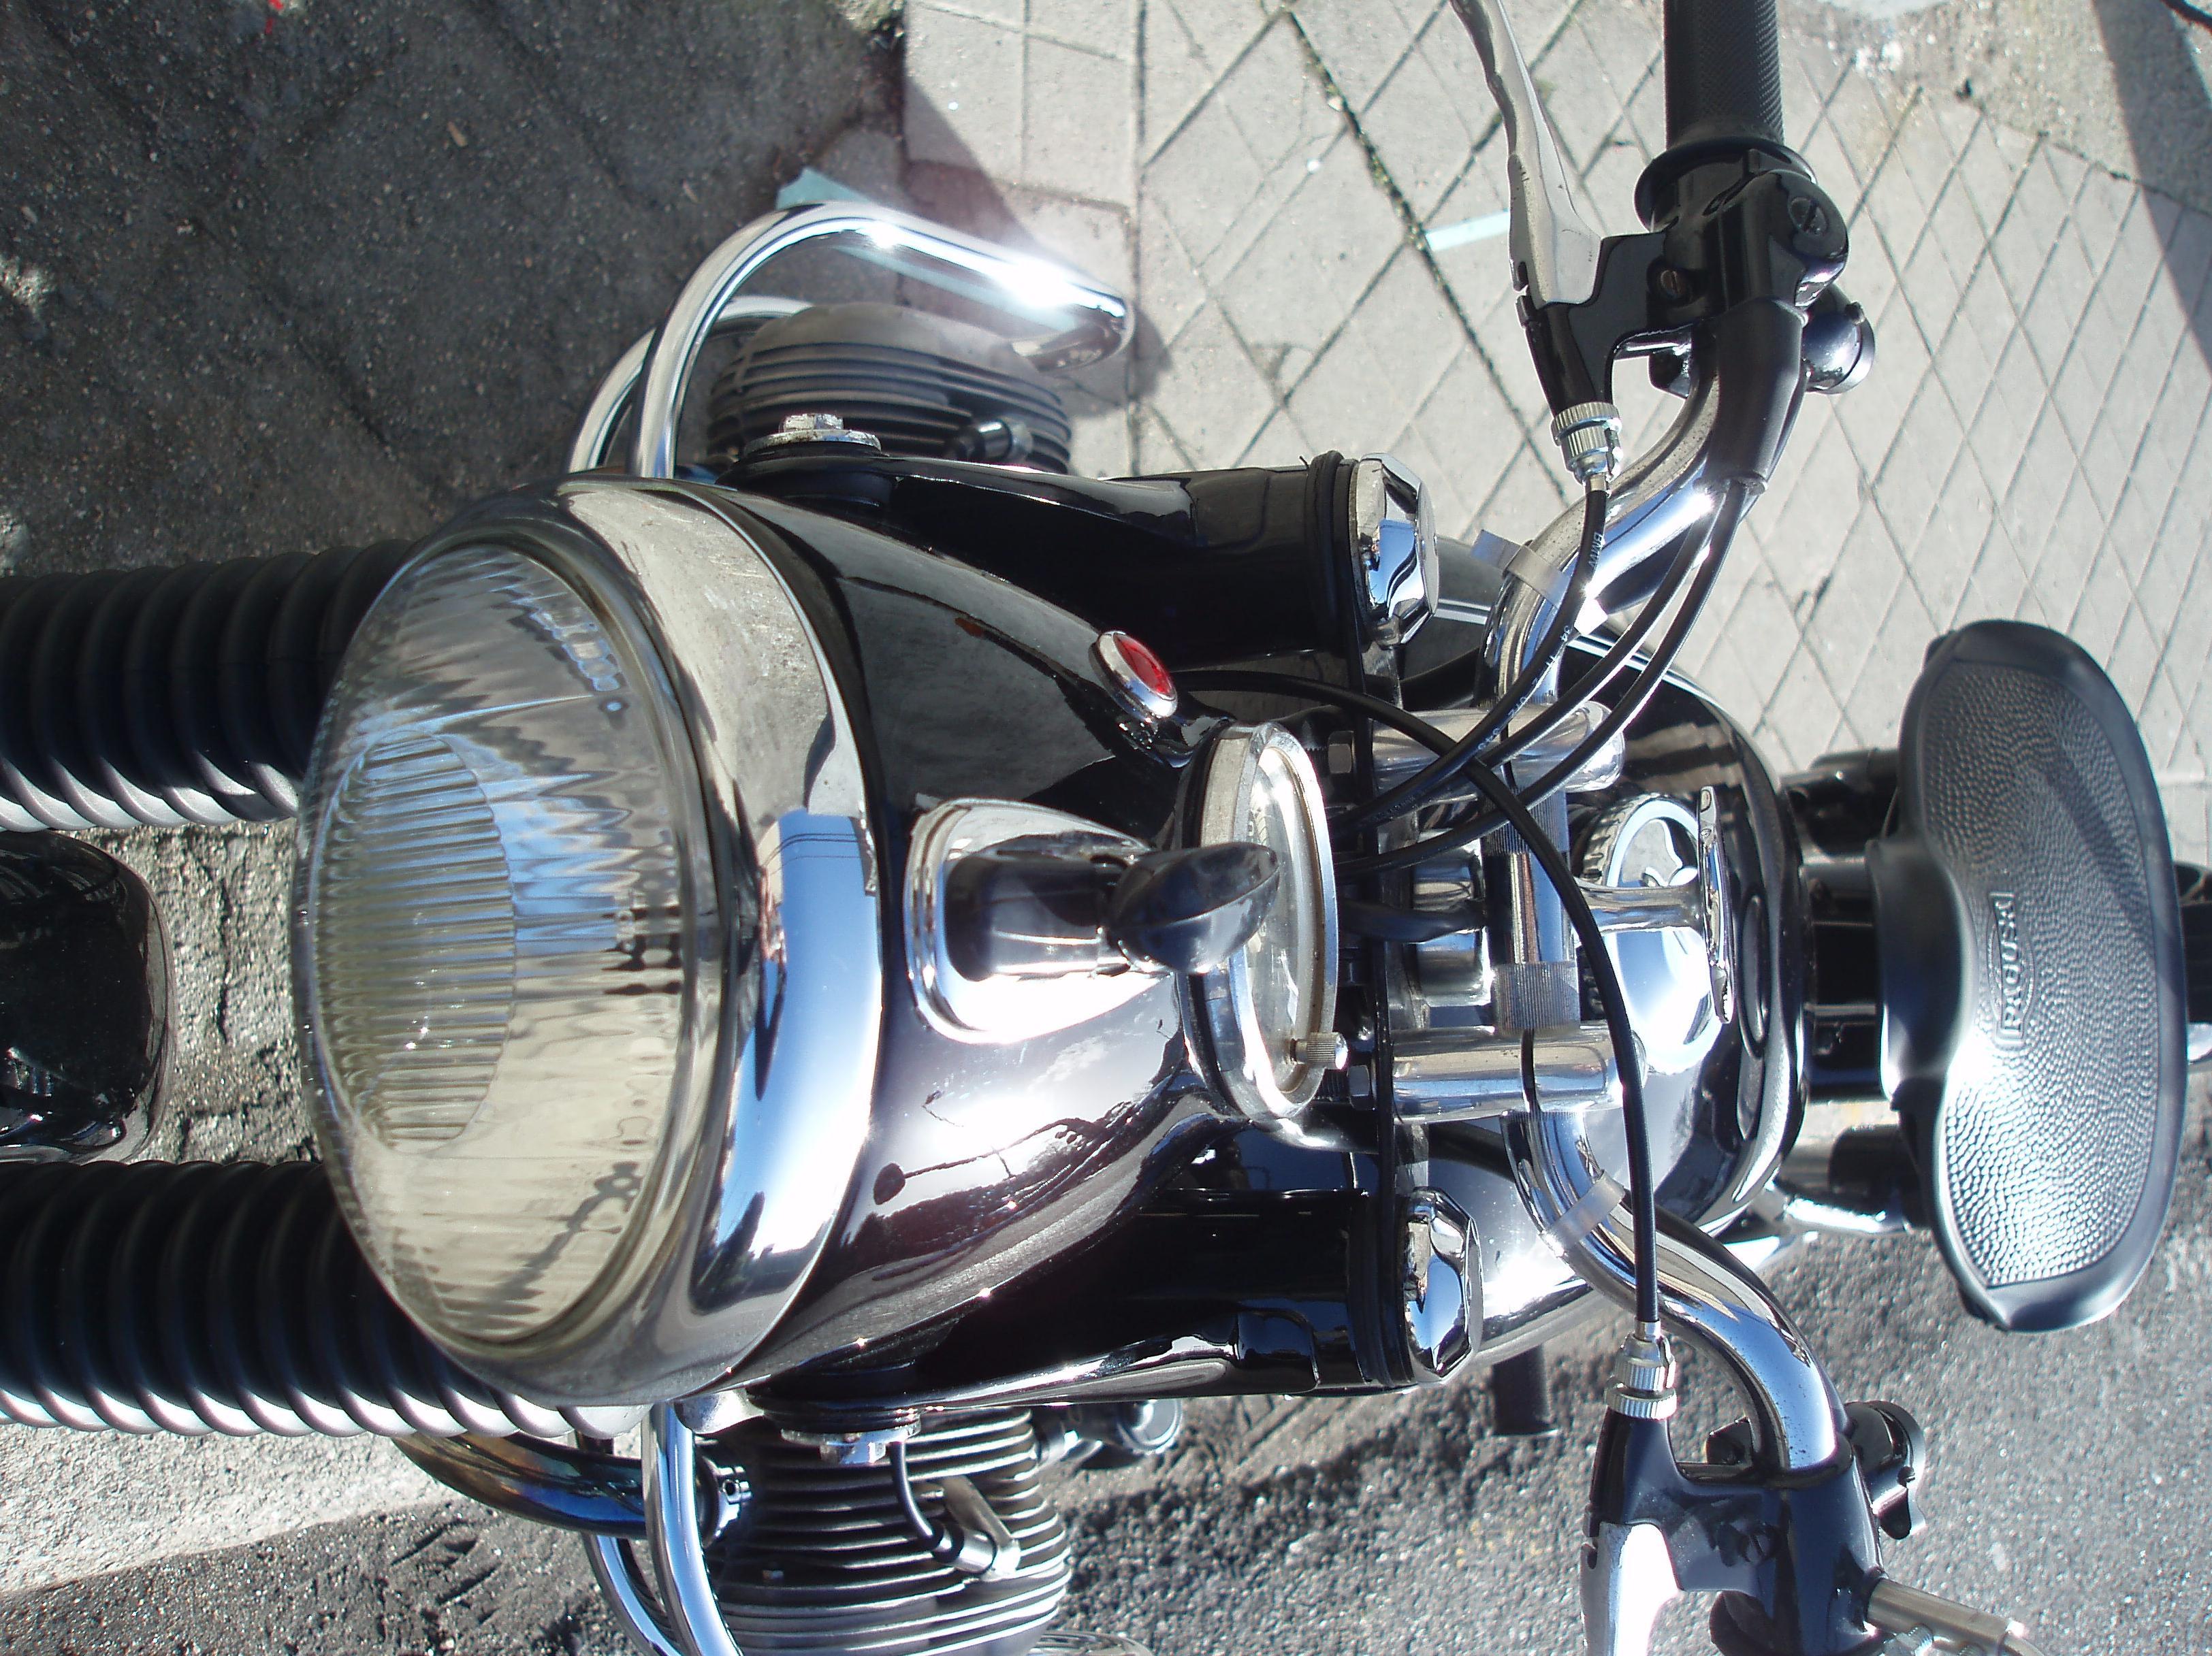 Foto 22 de Motos en Vigo | Moto 2